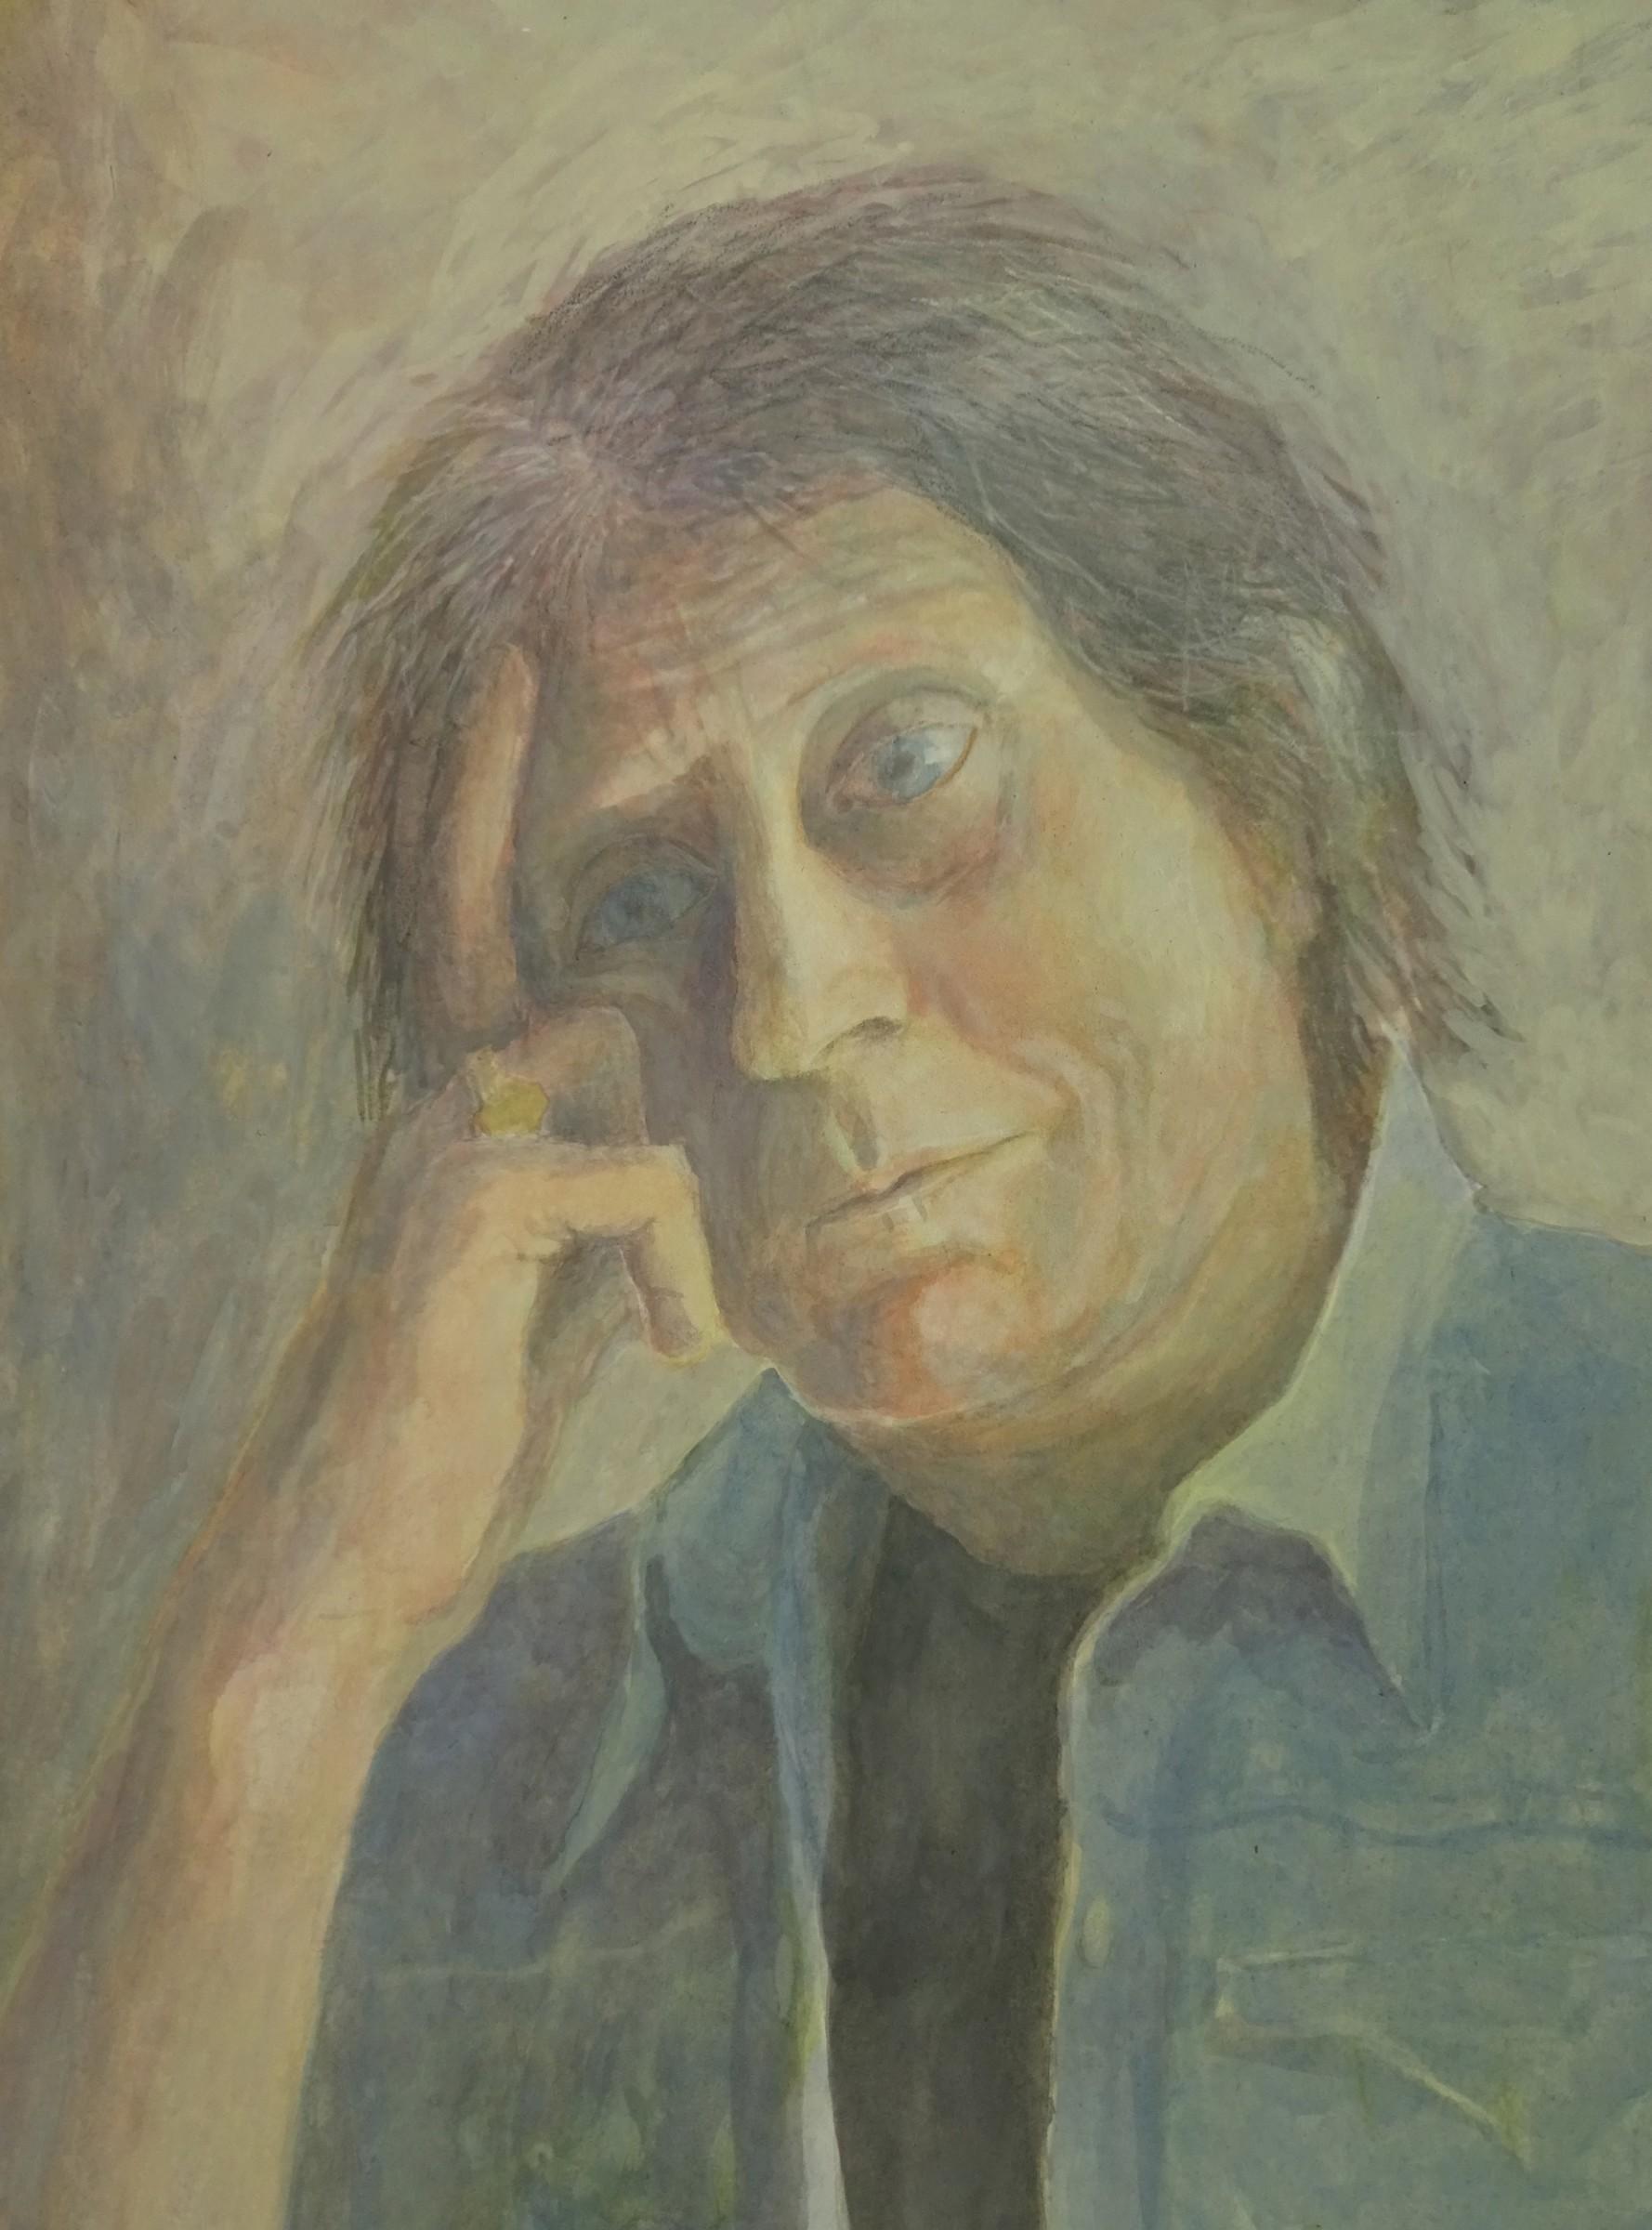 "<span class=""link fancybox-details-link""><a href=""/artists/70-sarah-holliday/works/12064-sarah-holliday-pw/"">View Detail Page</a></span><div class=""artist""><span class=""artist""><strong>Sarah Holliday</strong></span></div><div class=""title""><em>PW</em></div><div class=""medium"">watercolour & gouache</div><div class=""dimensions"">Frame: 50 x 40 cm<br /> Artwork: 34 x 24 cm</div>"